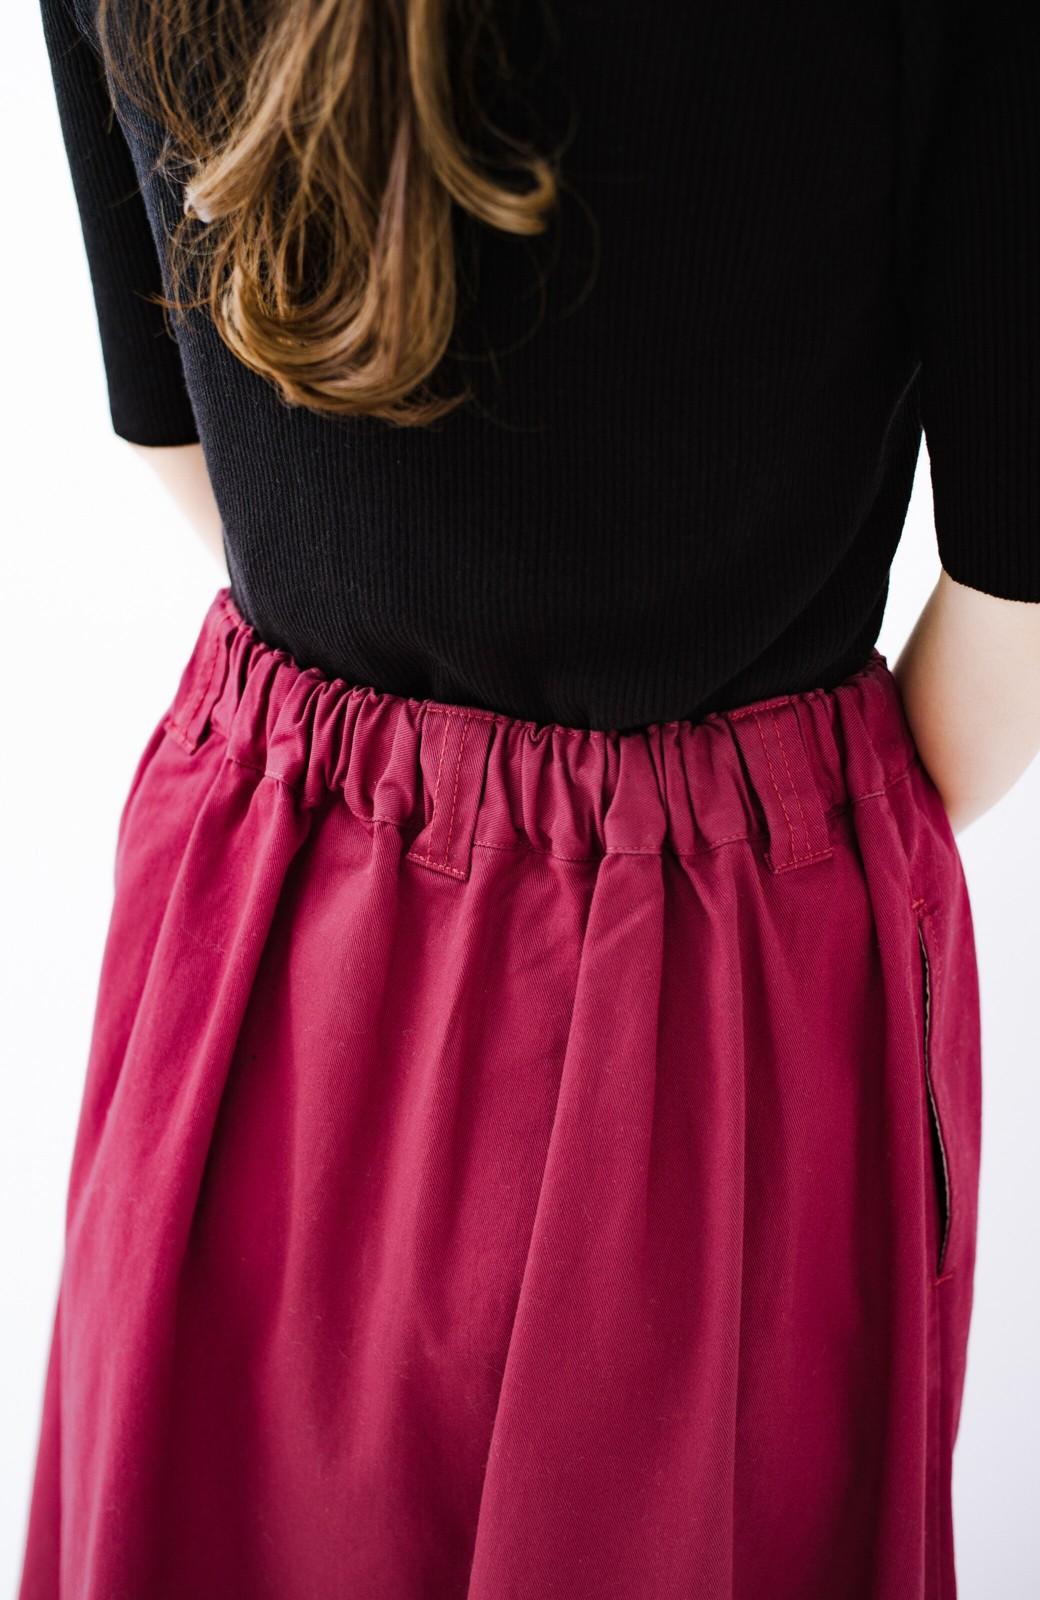 haco! ロングシーズン楽しめる タックボリュームのチノロングスカート <パープル>の商品写真8